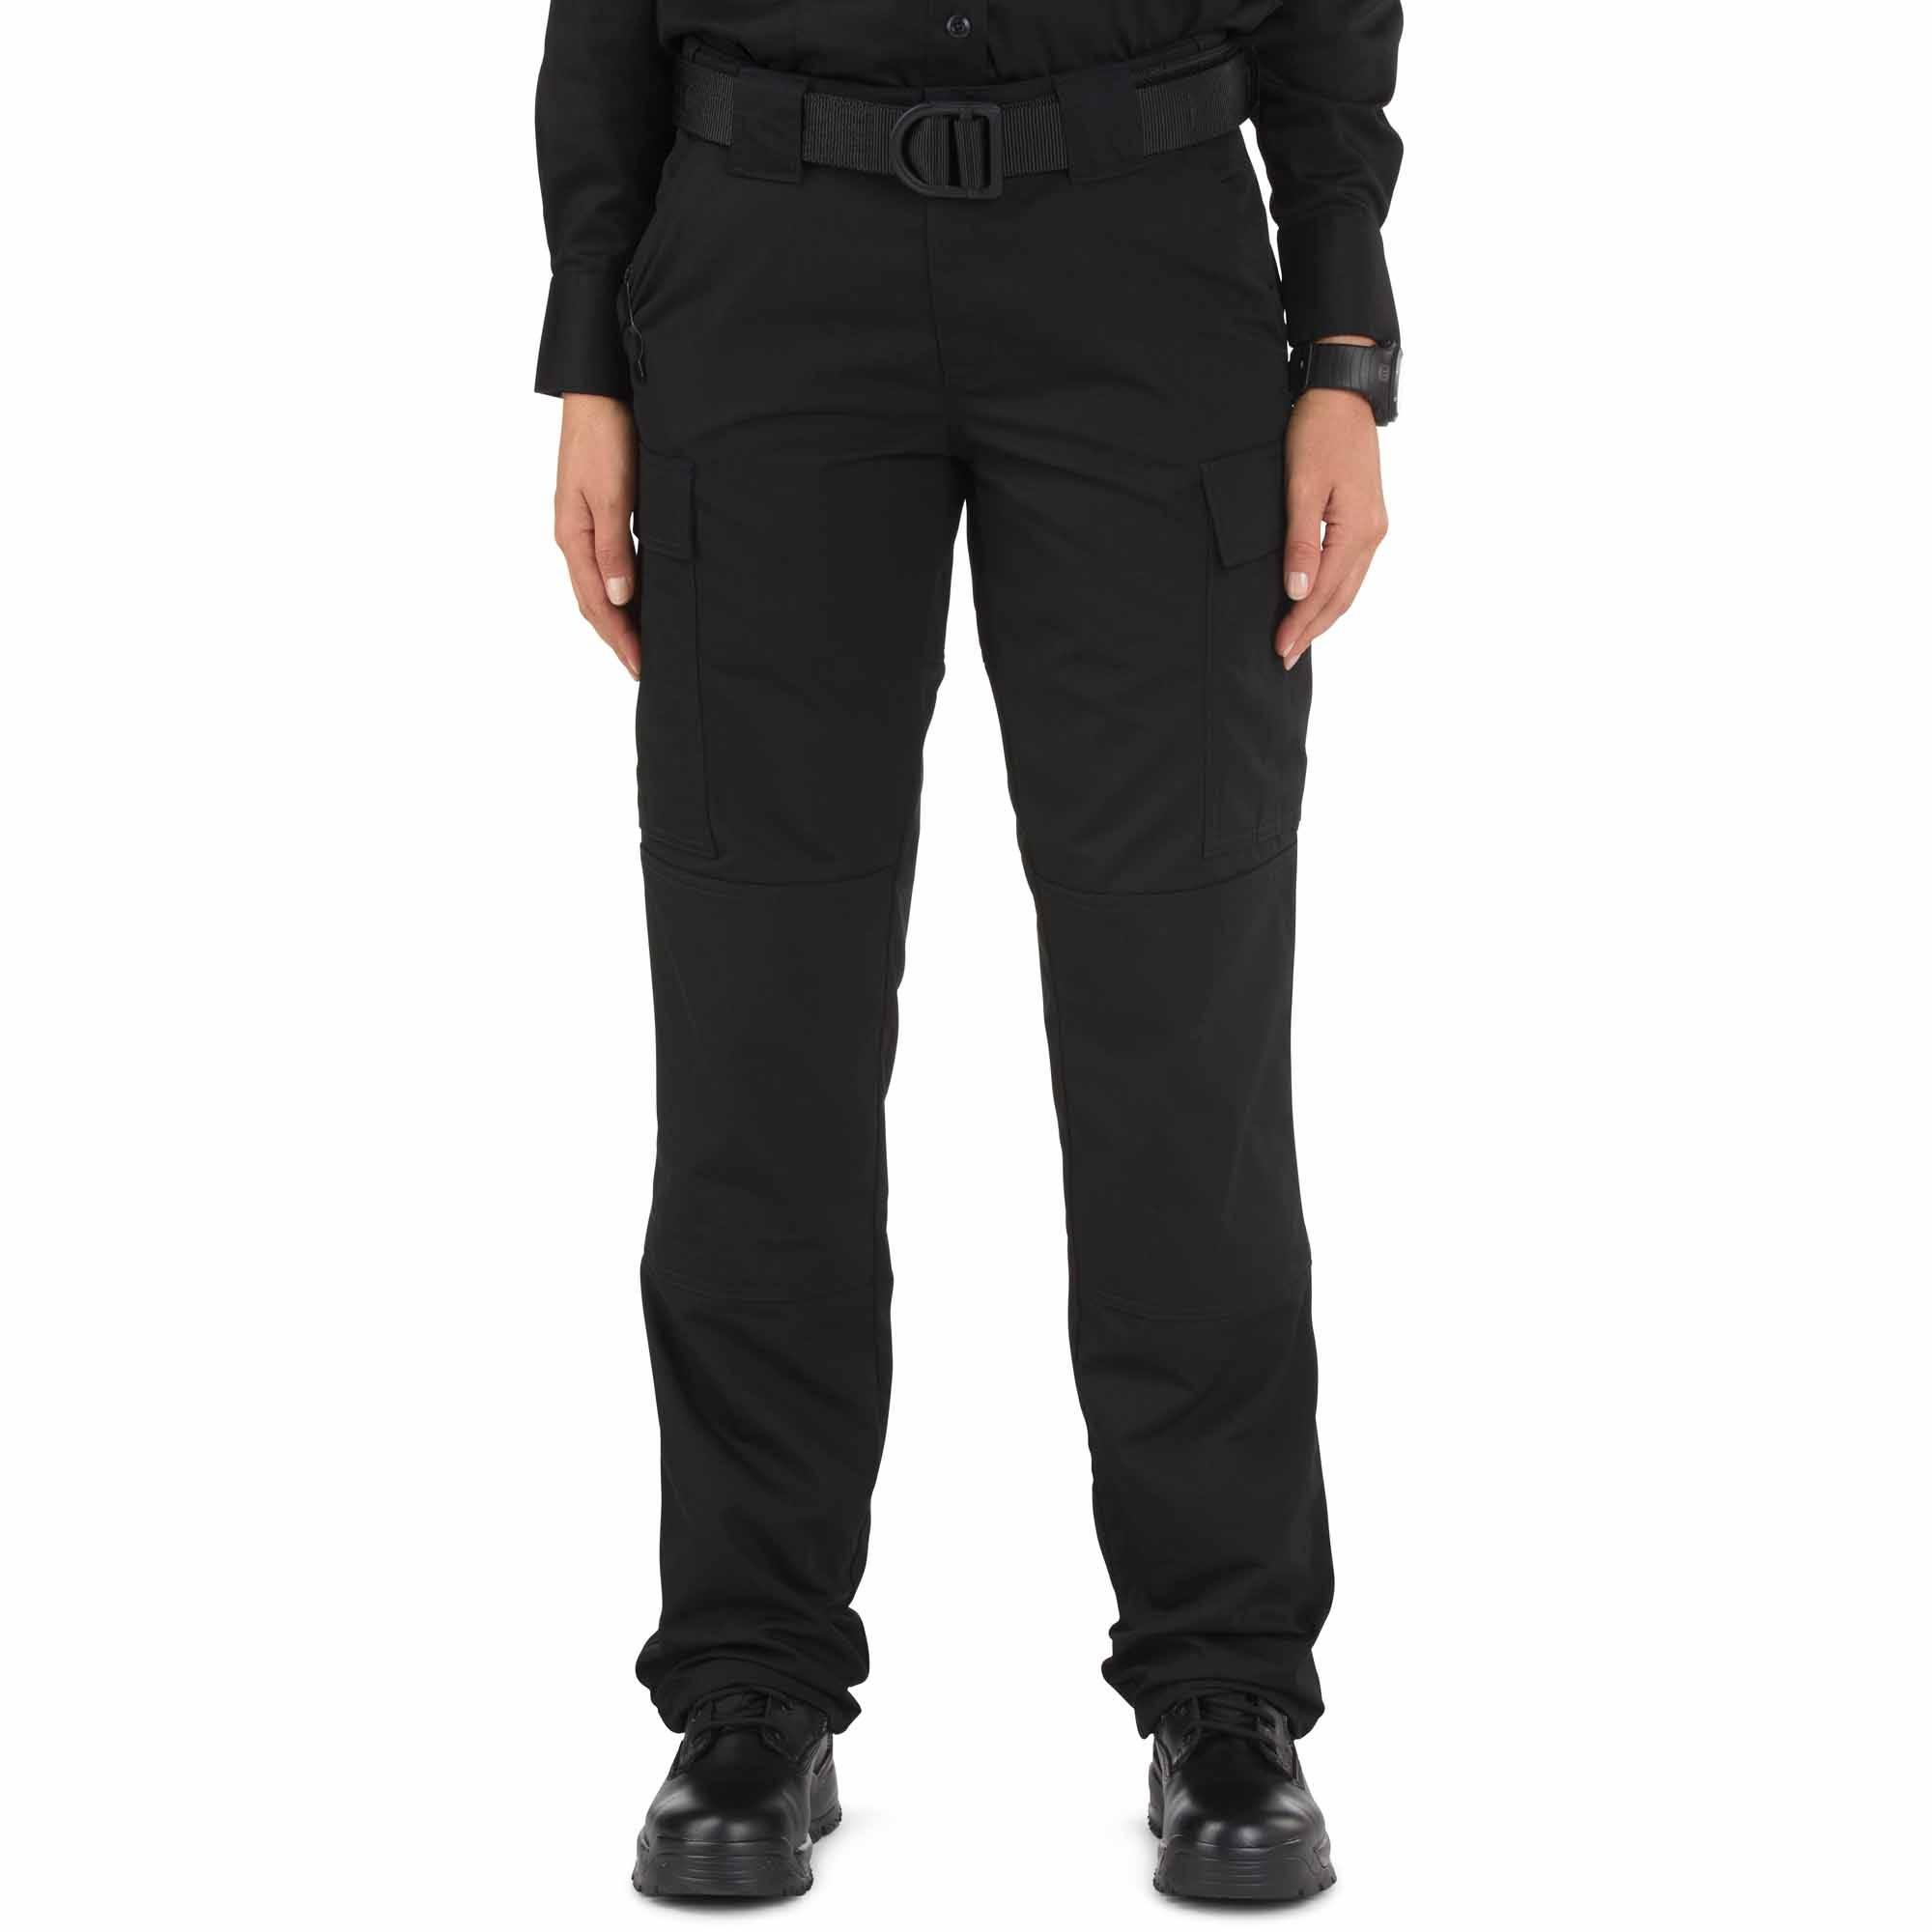 7e6b0d462 5.11 Stryke Women's EMS Pant. $59.99. Women's TACLITE EMS Pant. $49.99